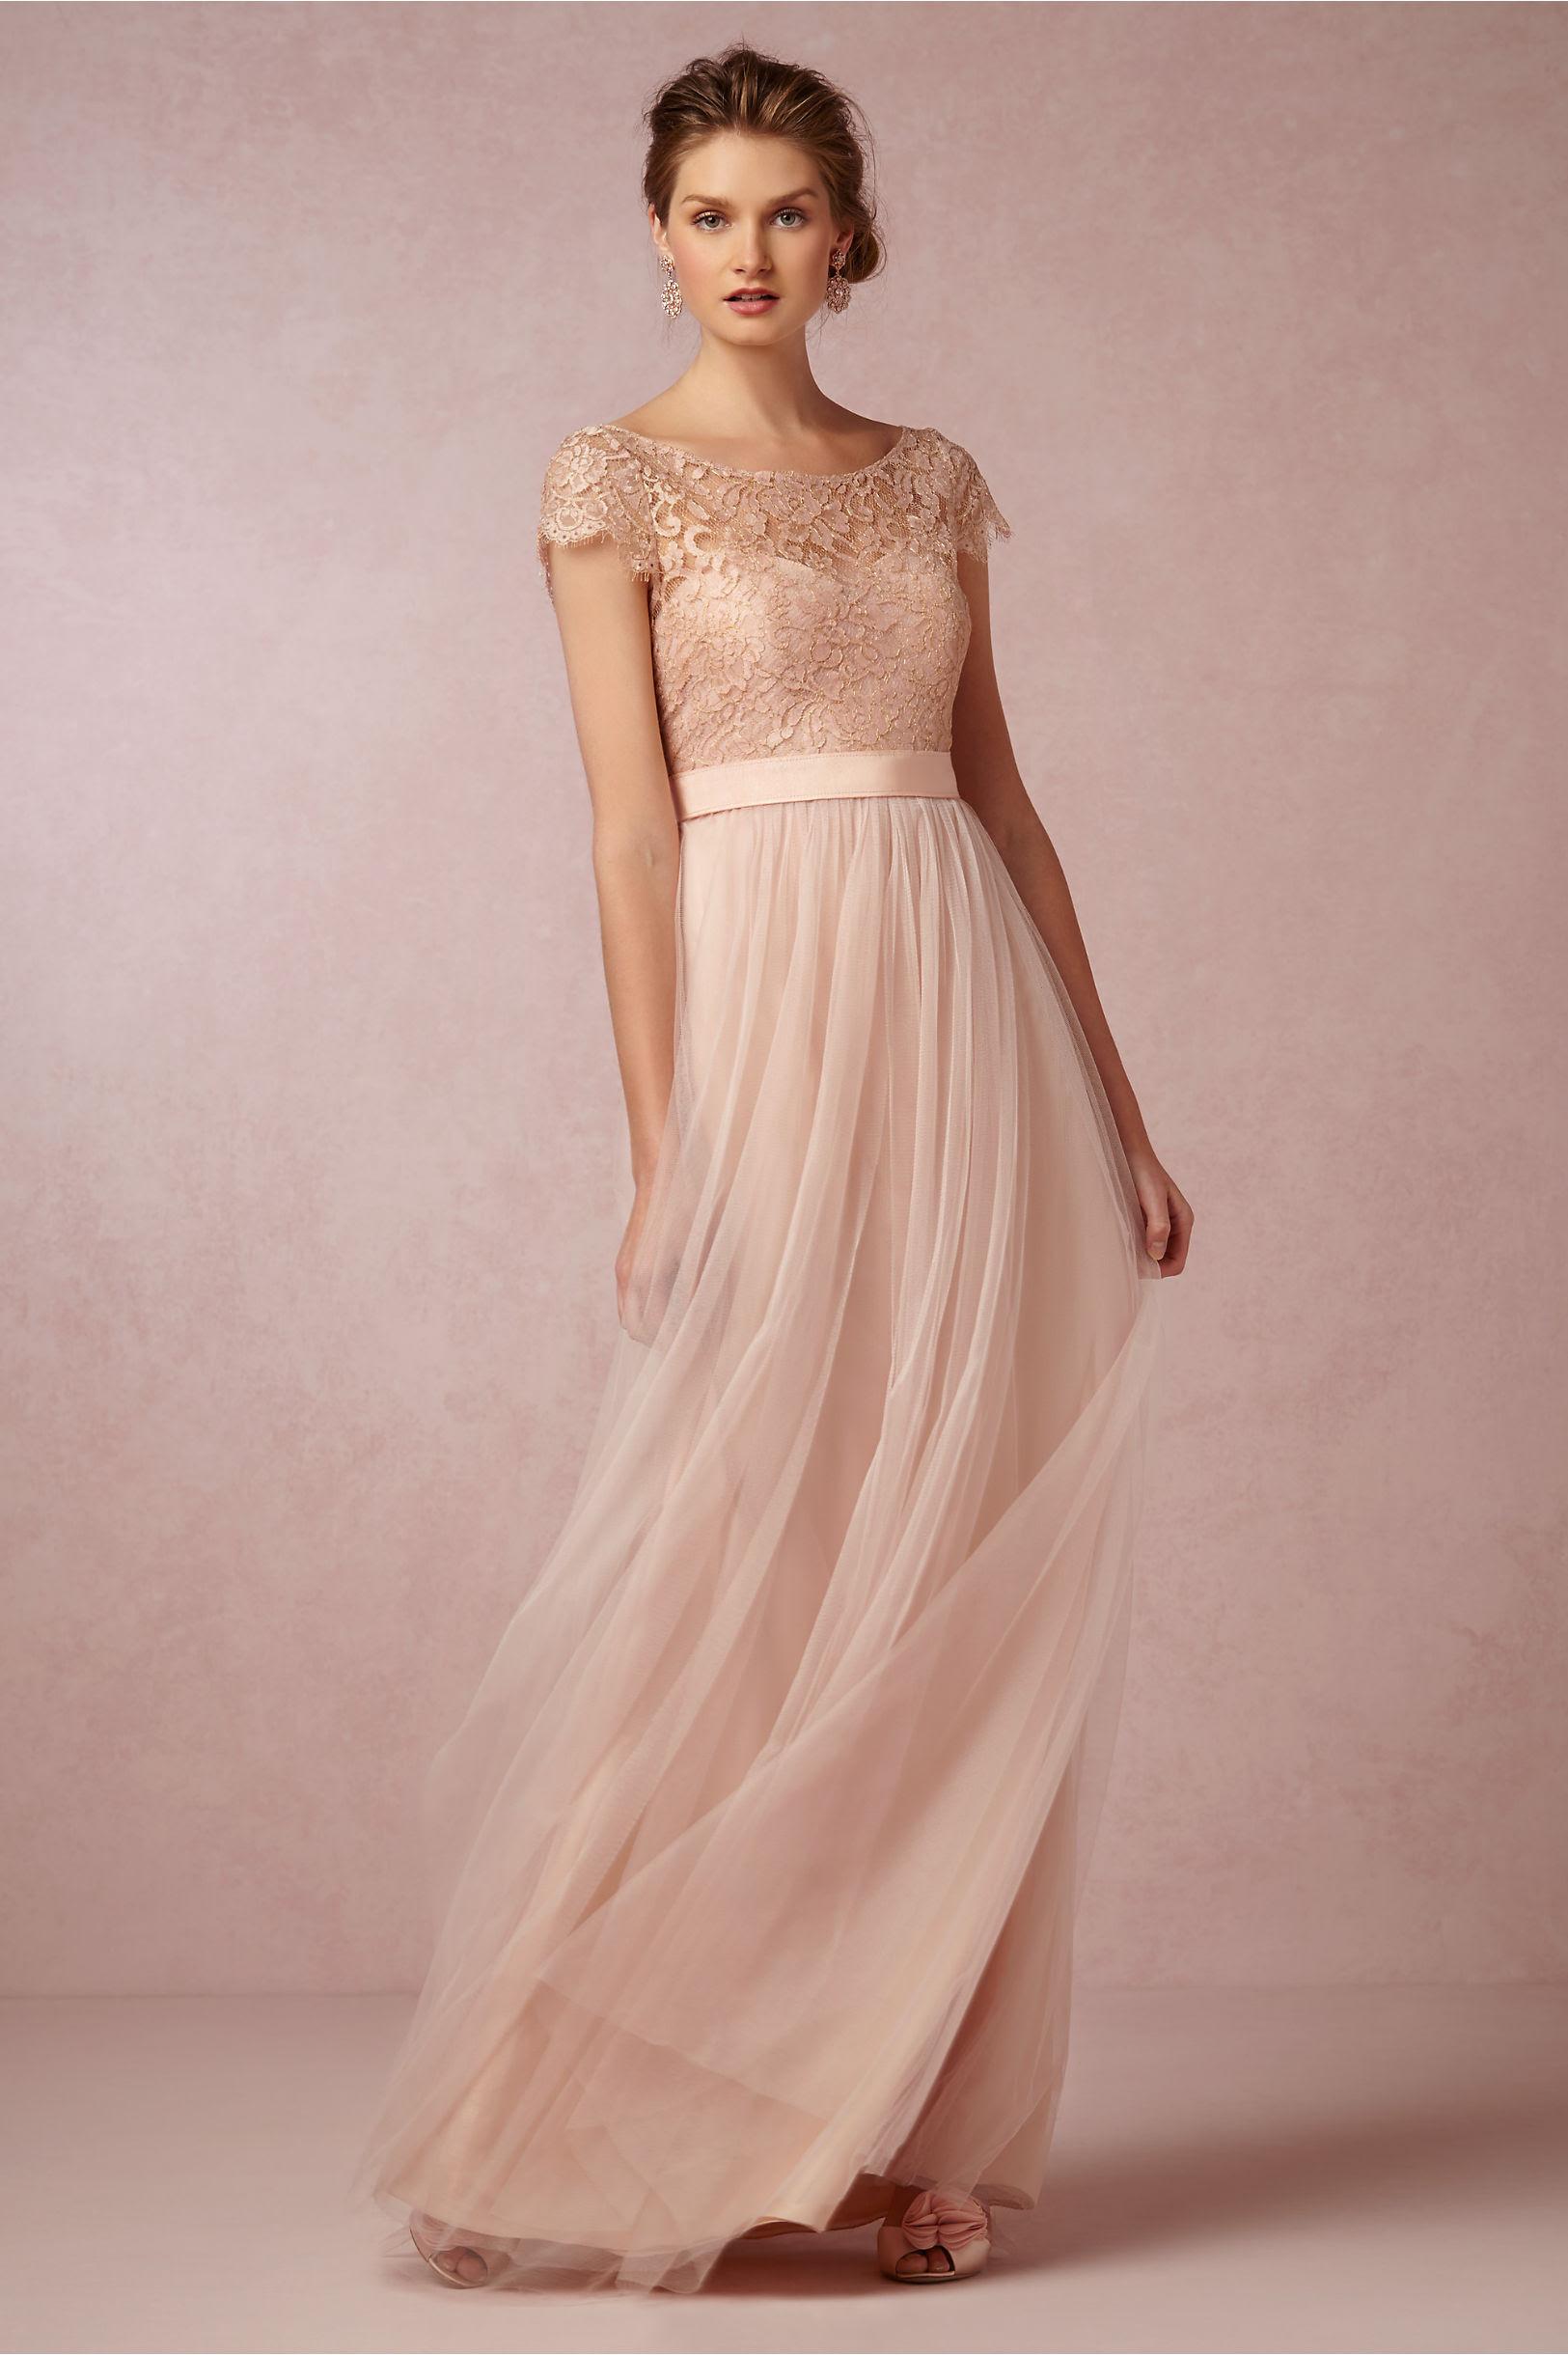 Vintage  Bateau Neck Illusion Cap Sleeved Lace Blush Tulle Bridesmaid Dress _1